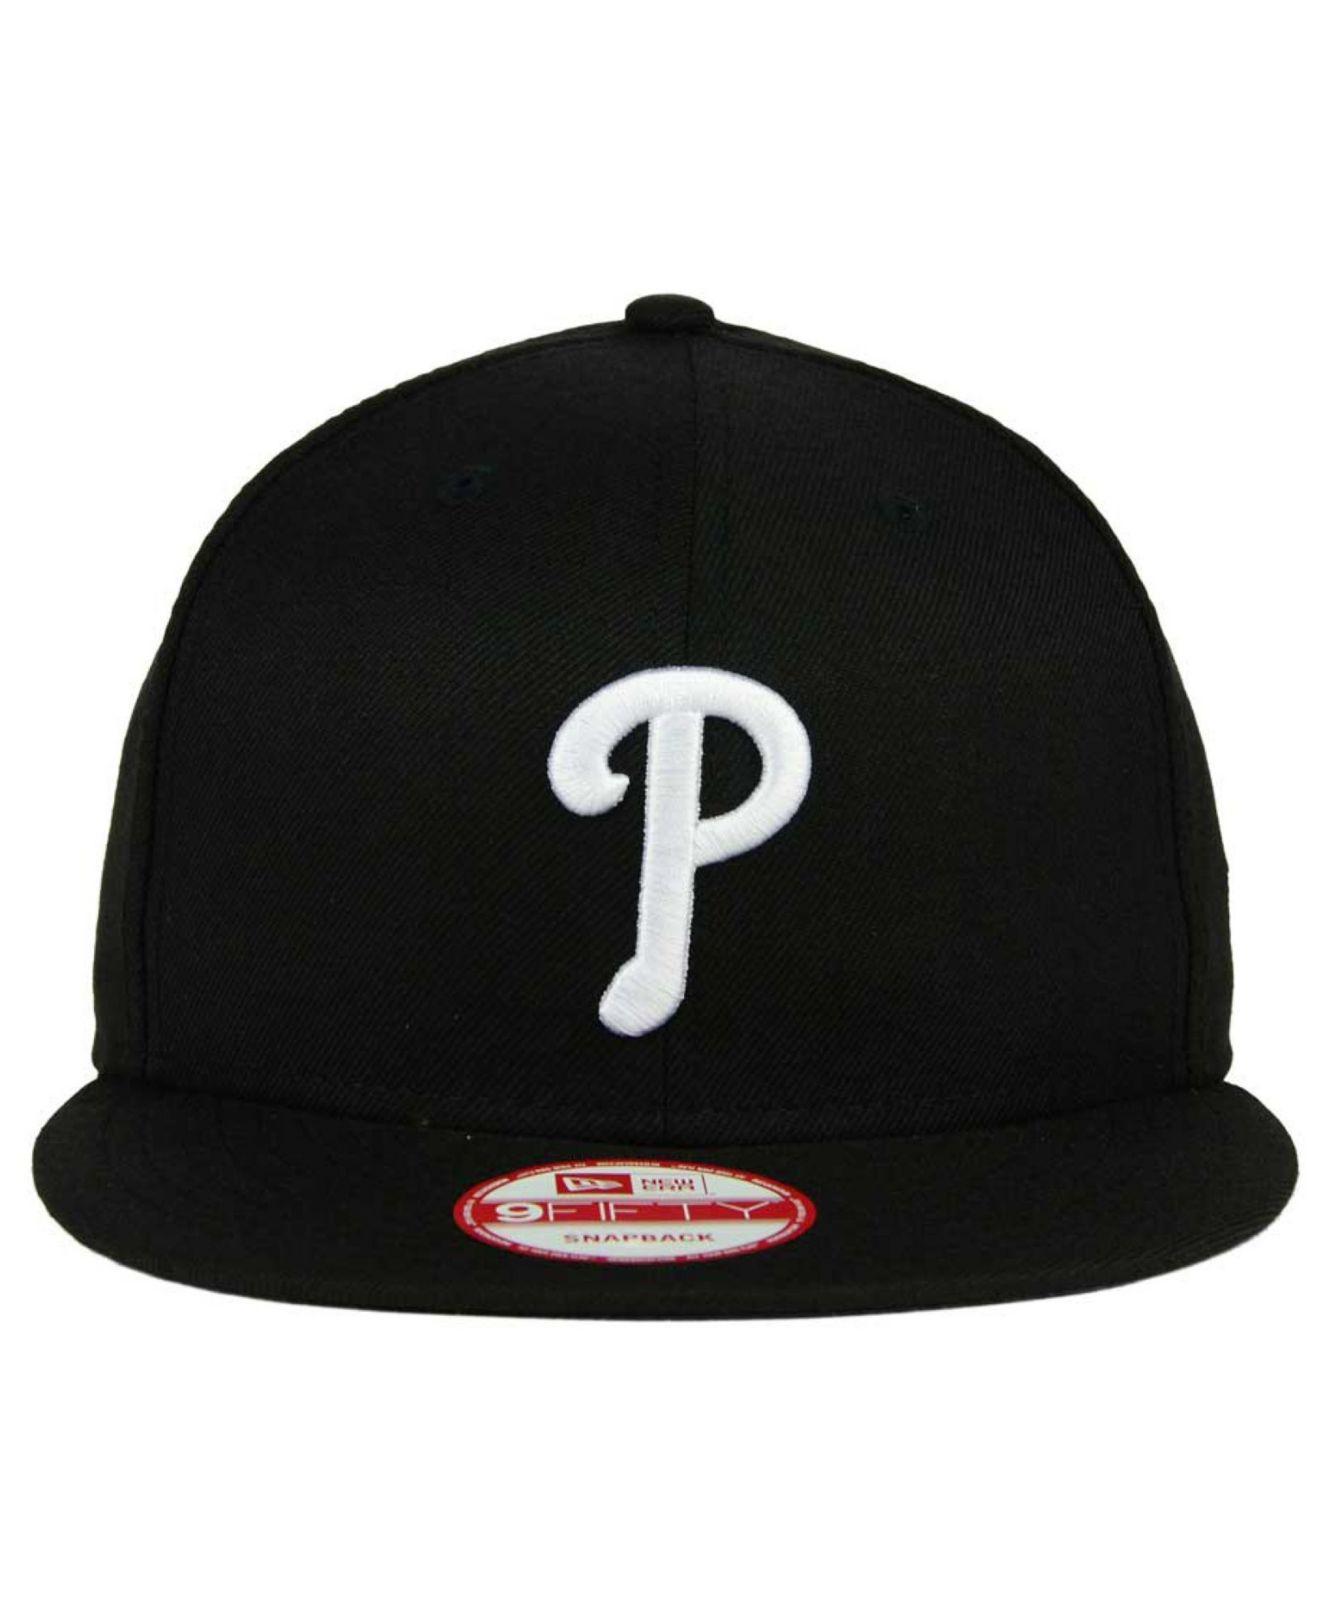 f141a54099b8d Lyst - KTZ Philadelphia Phillies B-dub 9fifty Snapback Cap in Black for Men